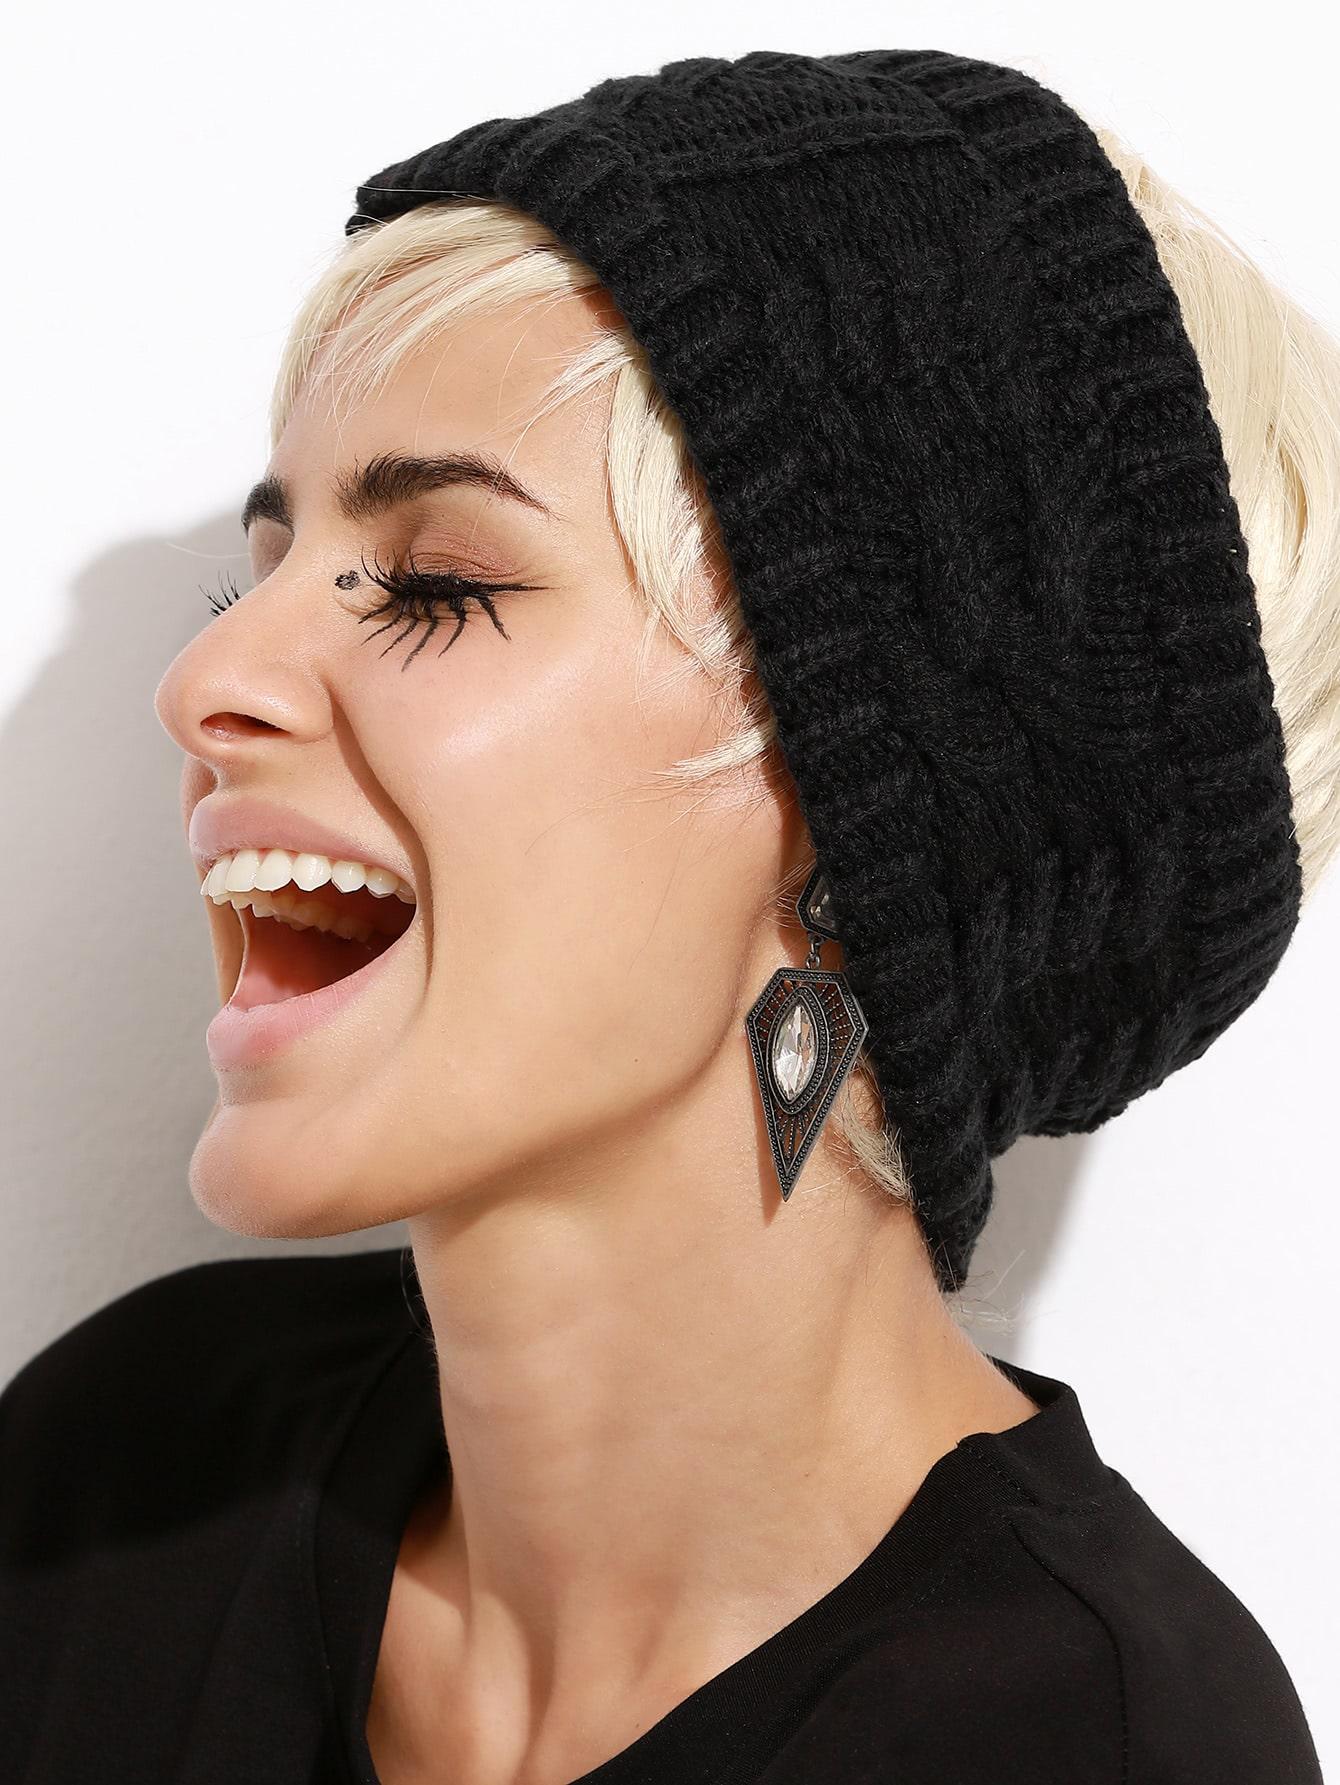 Black Cable Knit Open Top HatBlack Cable Knit Open Top Hat<br><br>color: Black<br>size: one-size